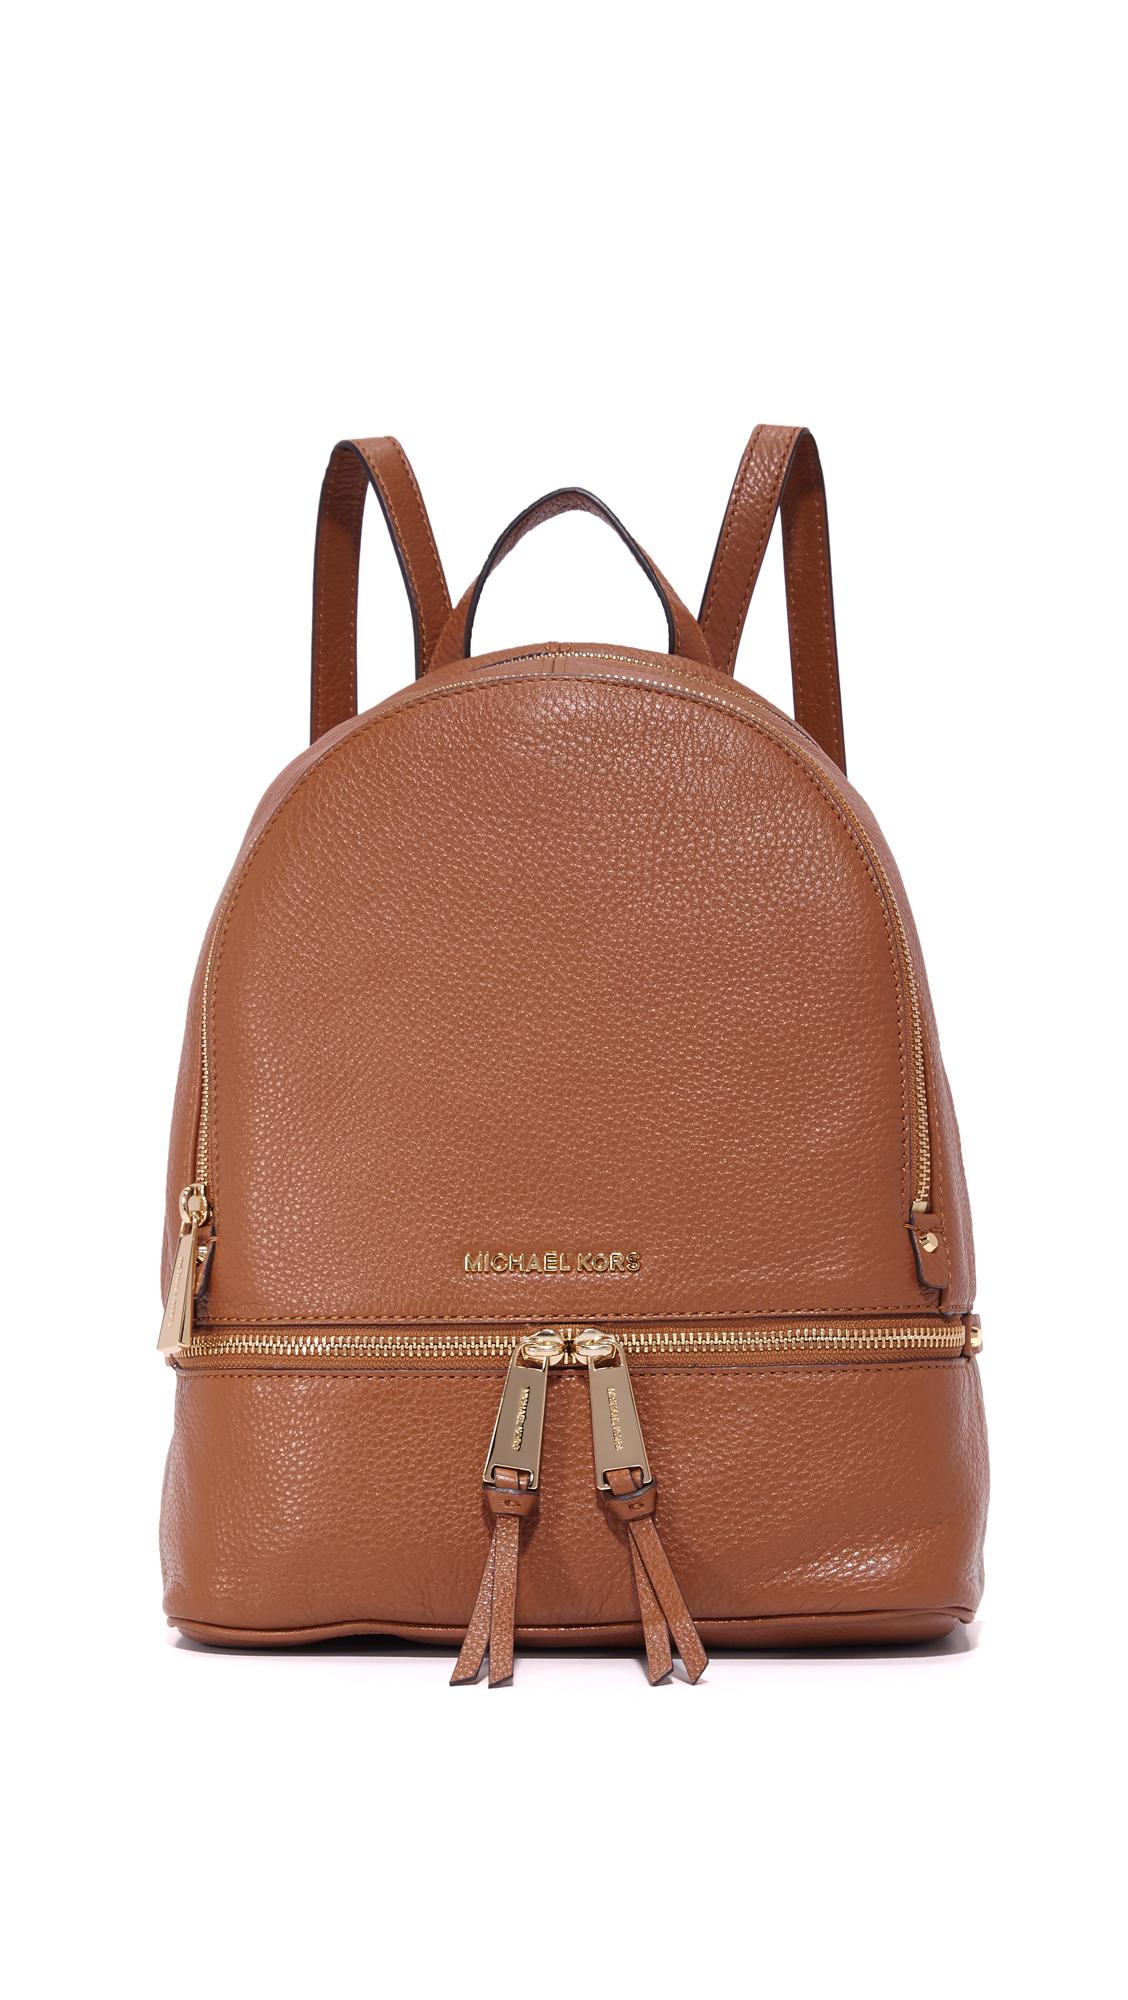 c4c038374ffd ... shopping michael michael kors rhea small backpack shopbop 88675 94a61